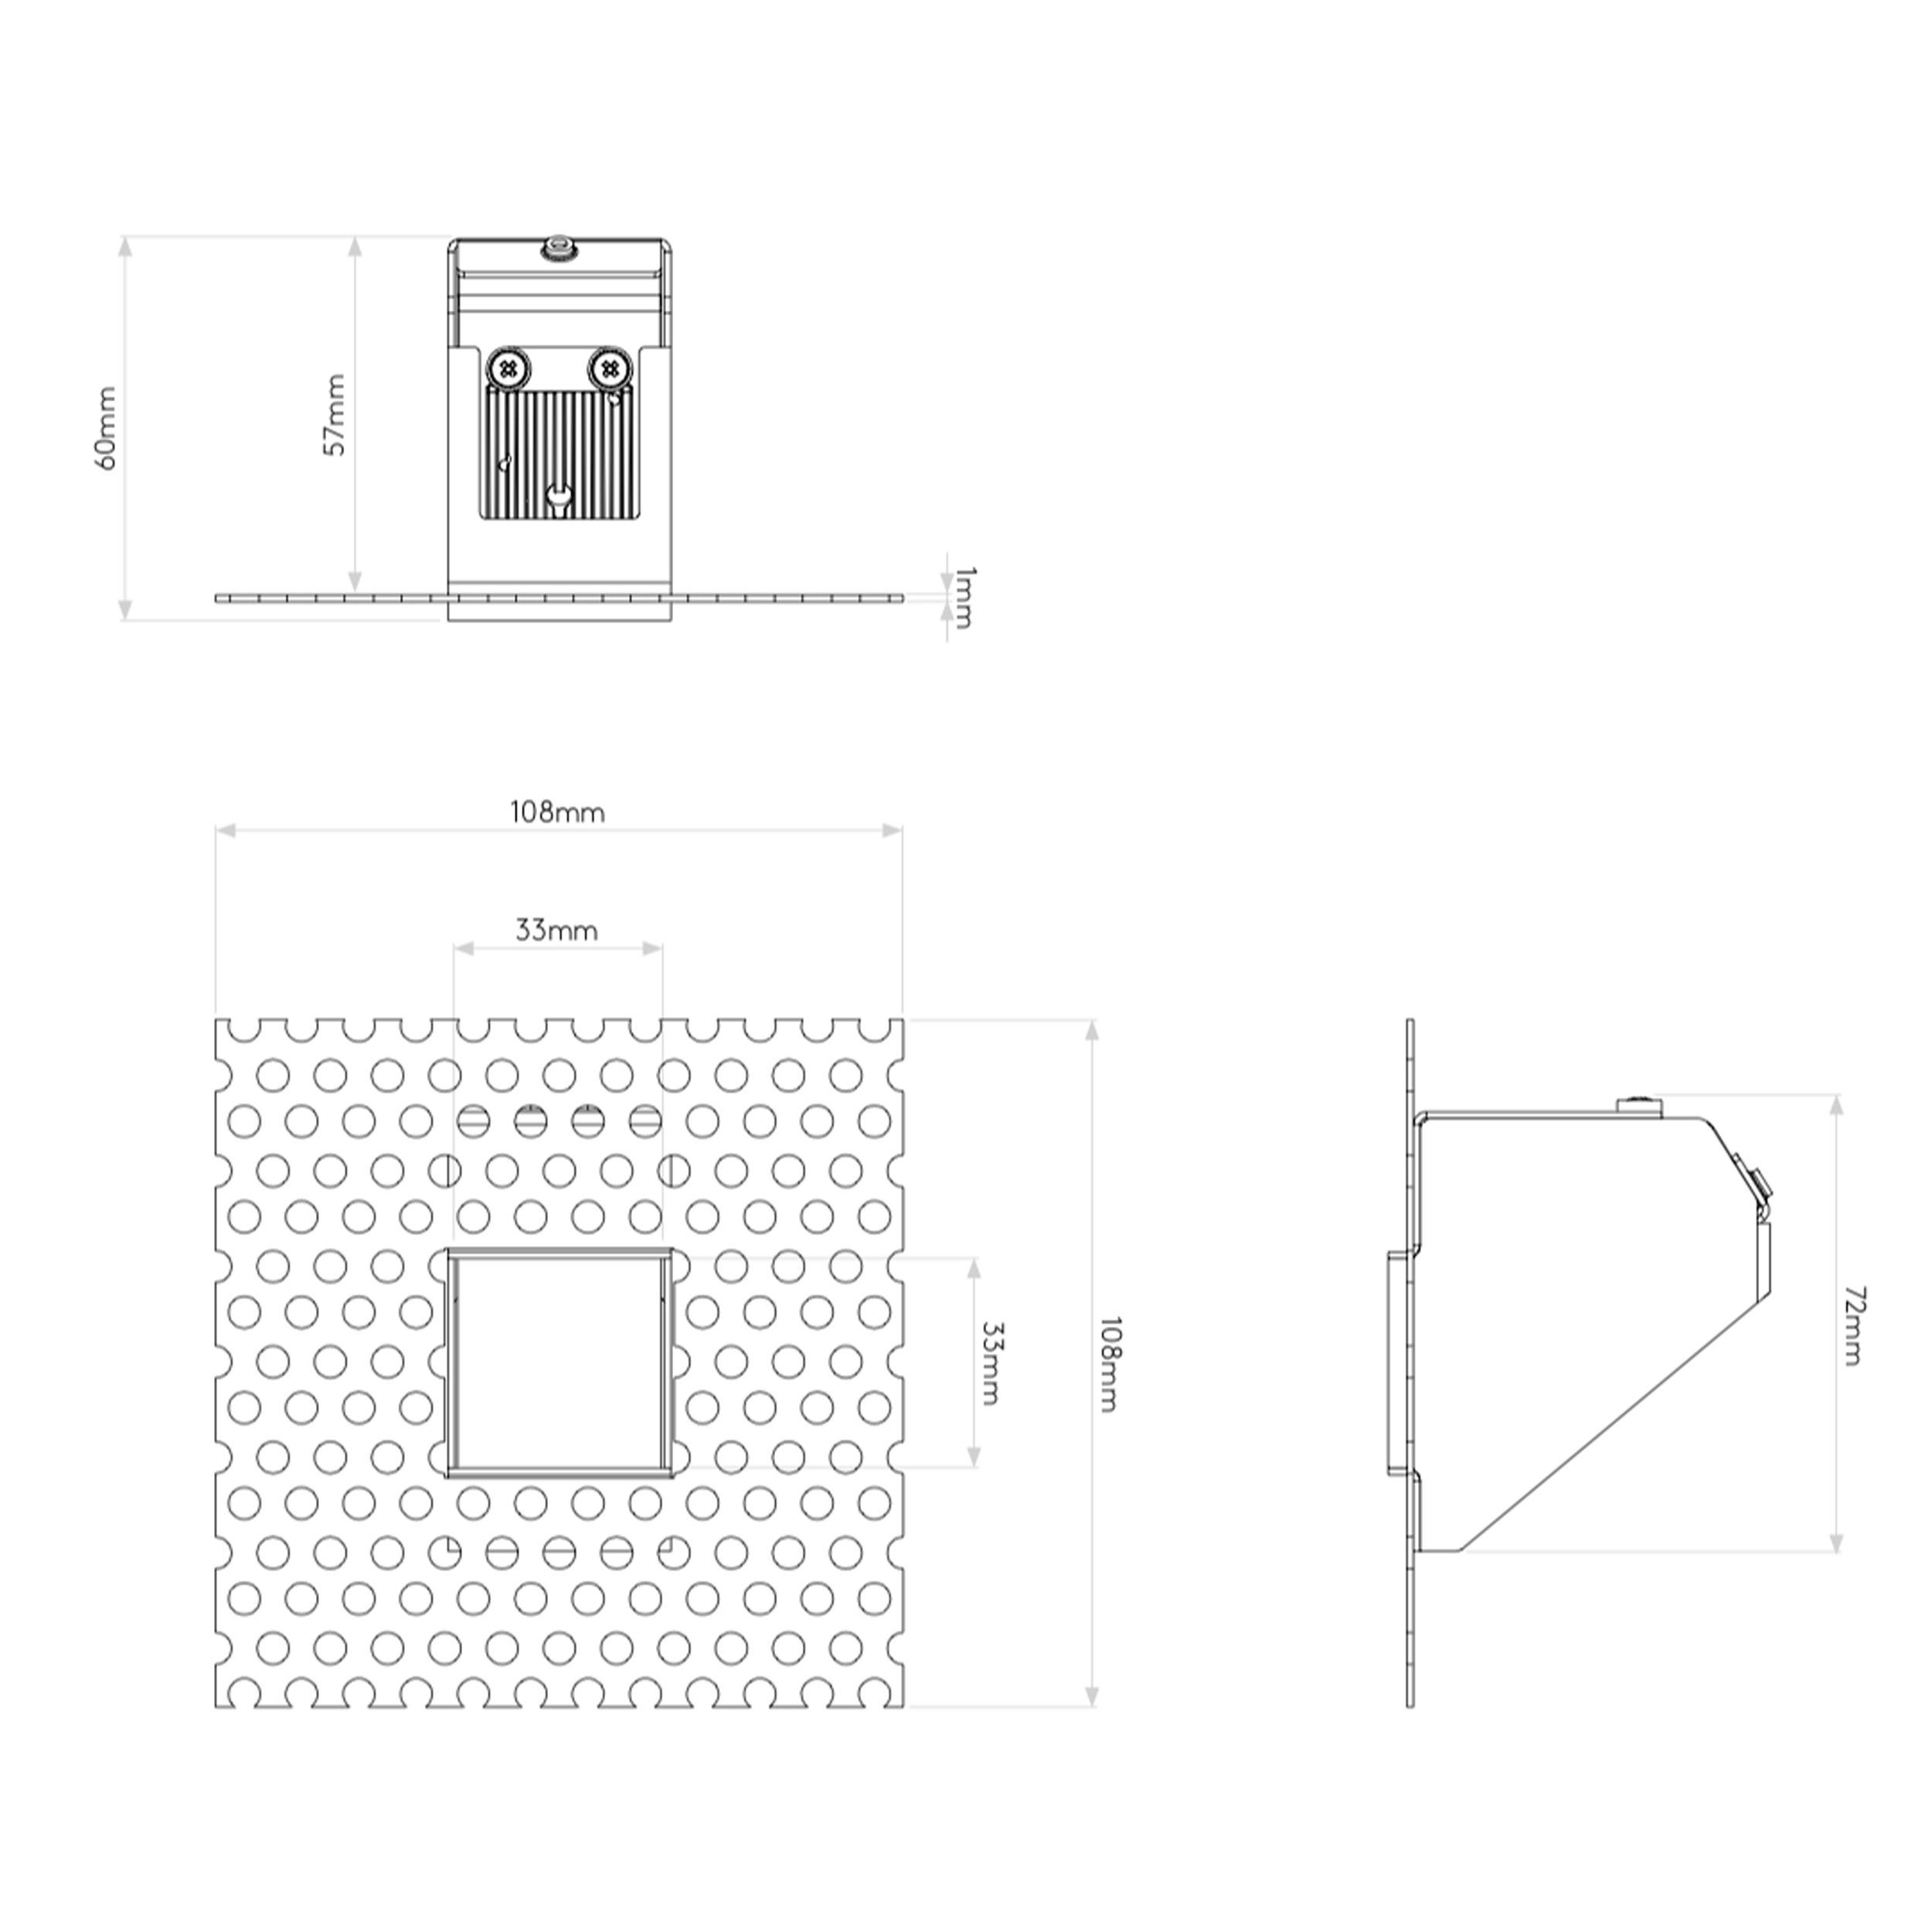 Astro Borgo Trimless Mini Wall Light Line Drawing